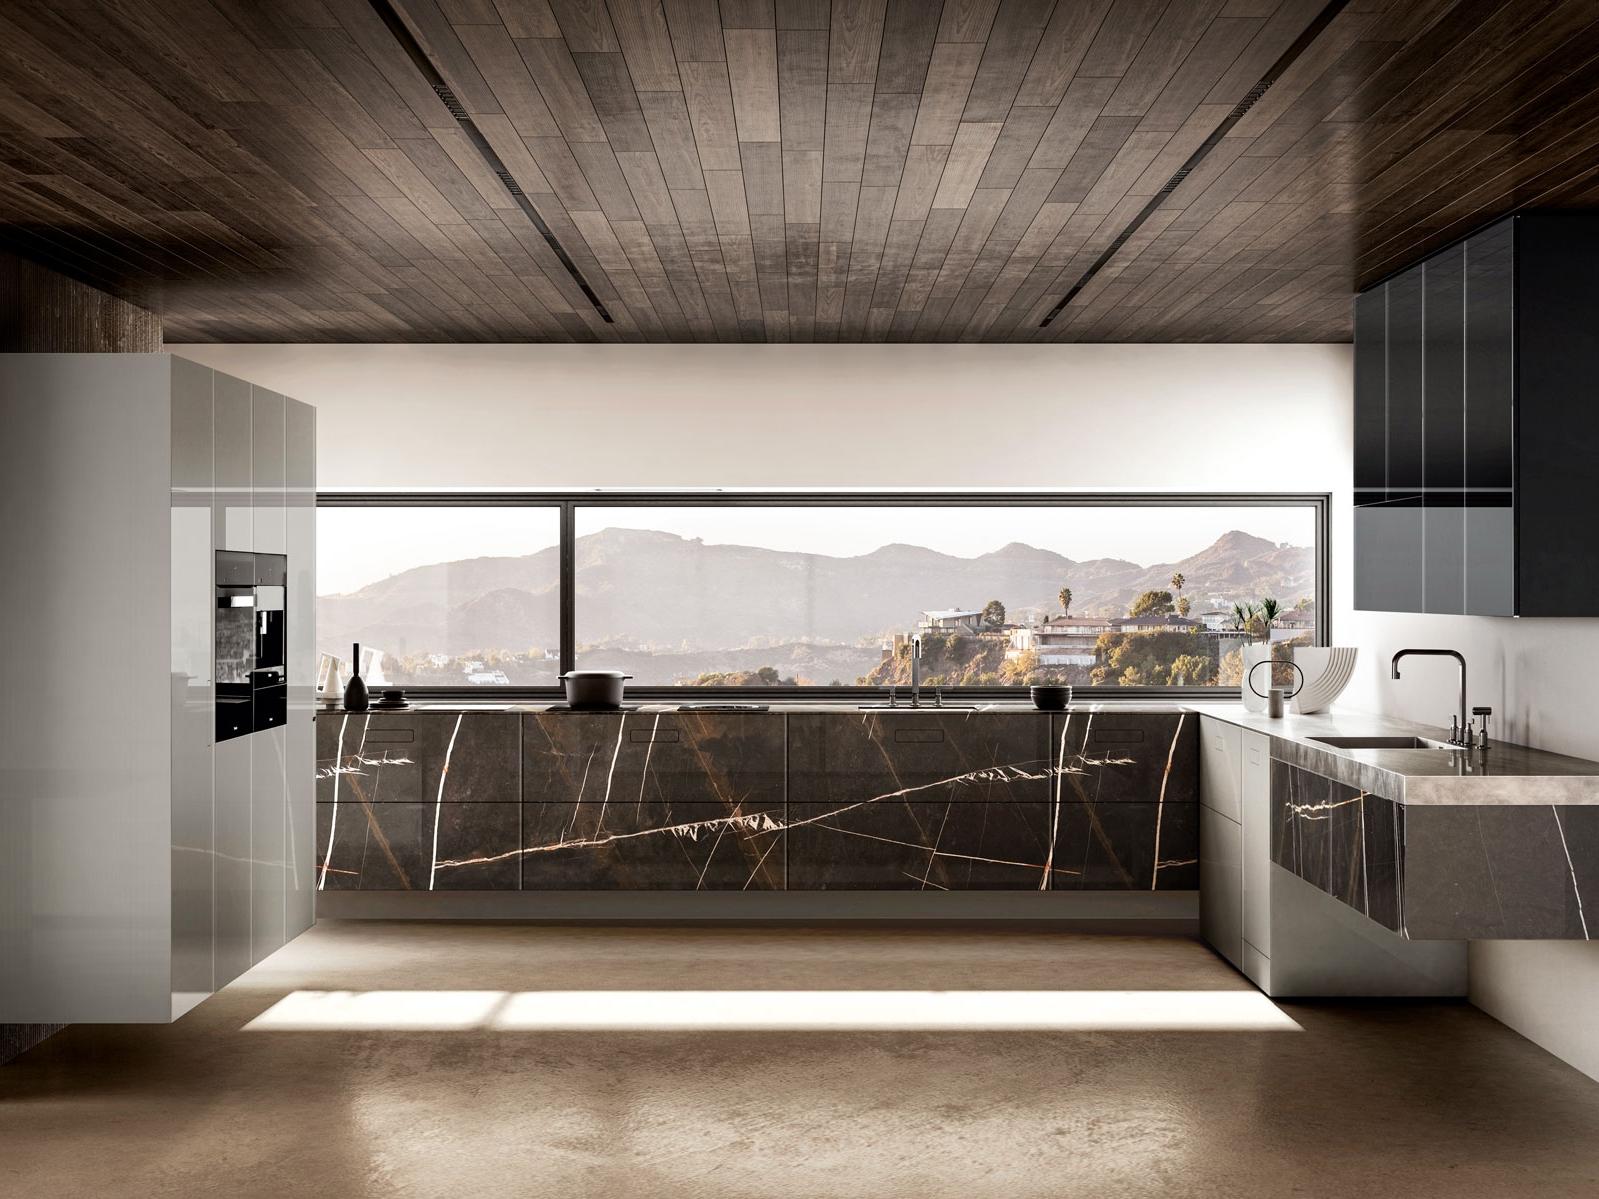 36e8-marble-xglass-linear-kitchen-lago-415322-rel747e9b3e